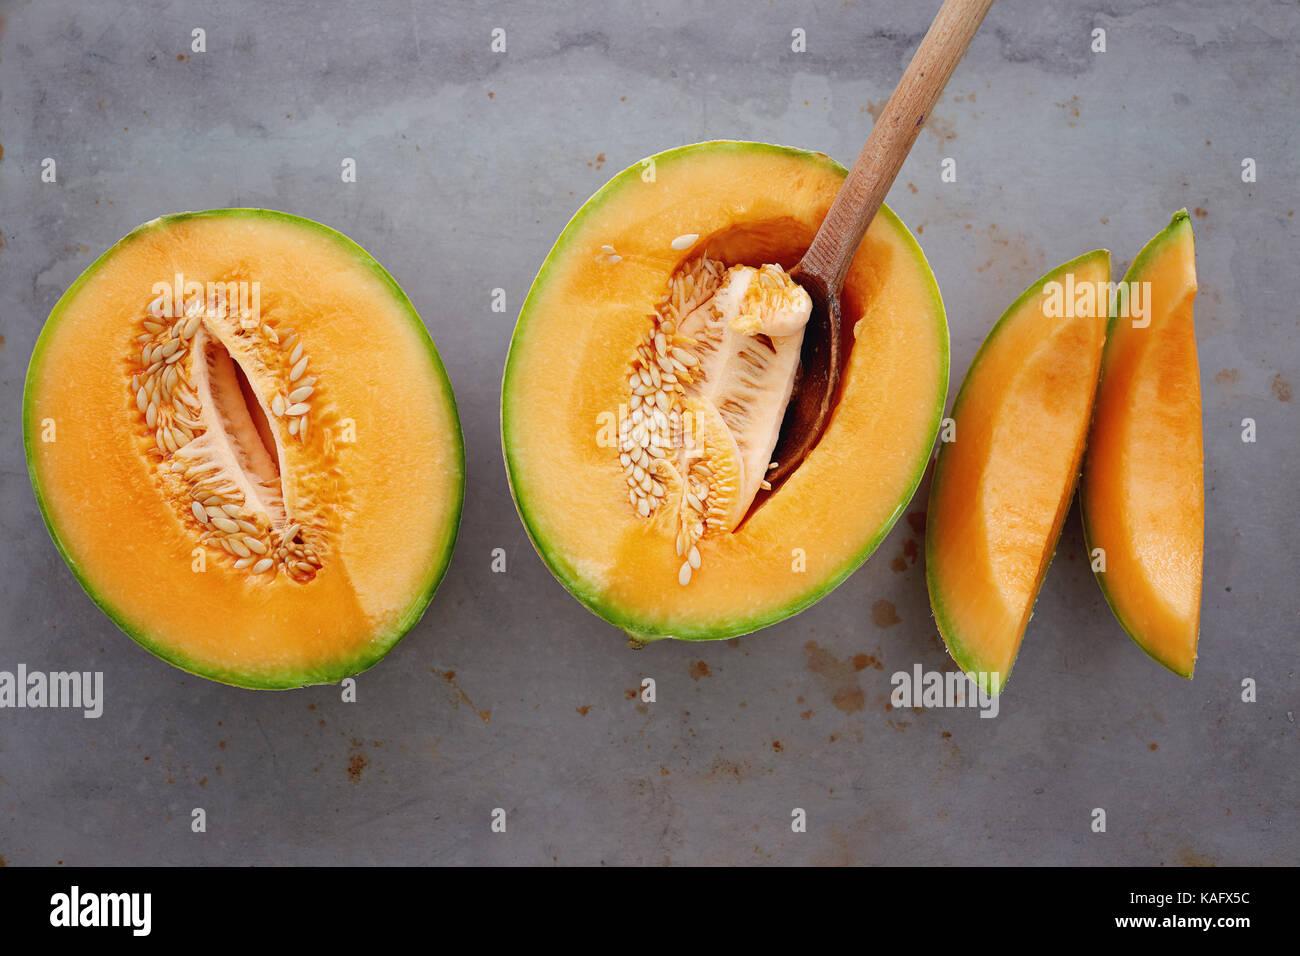 Melone freschi tagliati a pezzetti. tagliata a metà di melone maturo melone al cucchiaio. Immagini Stock